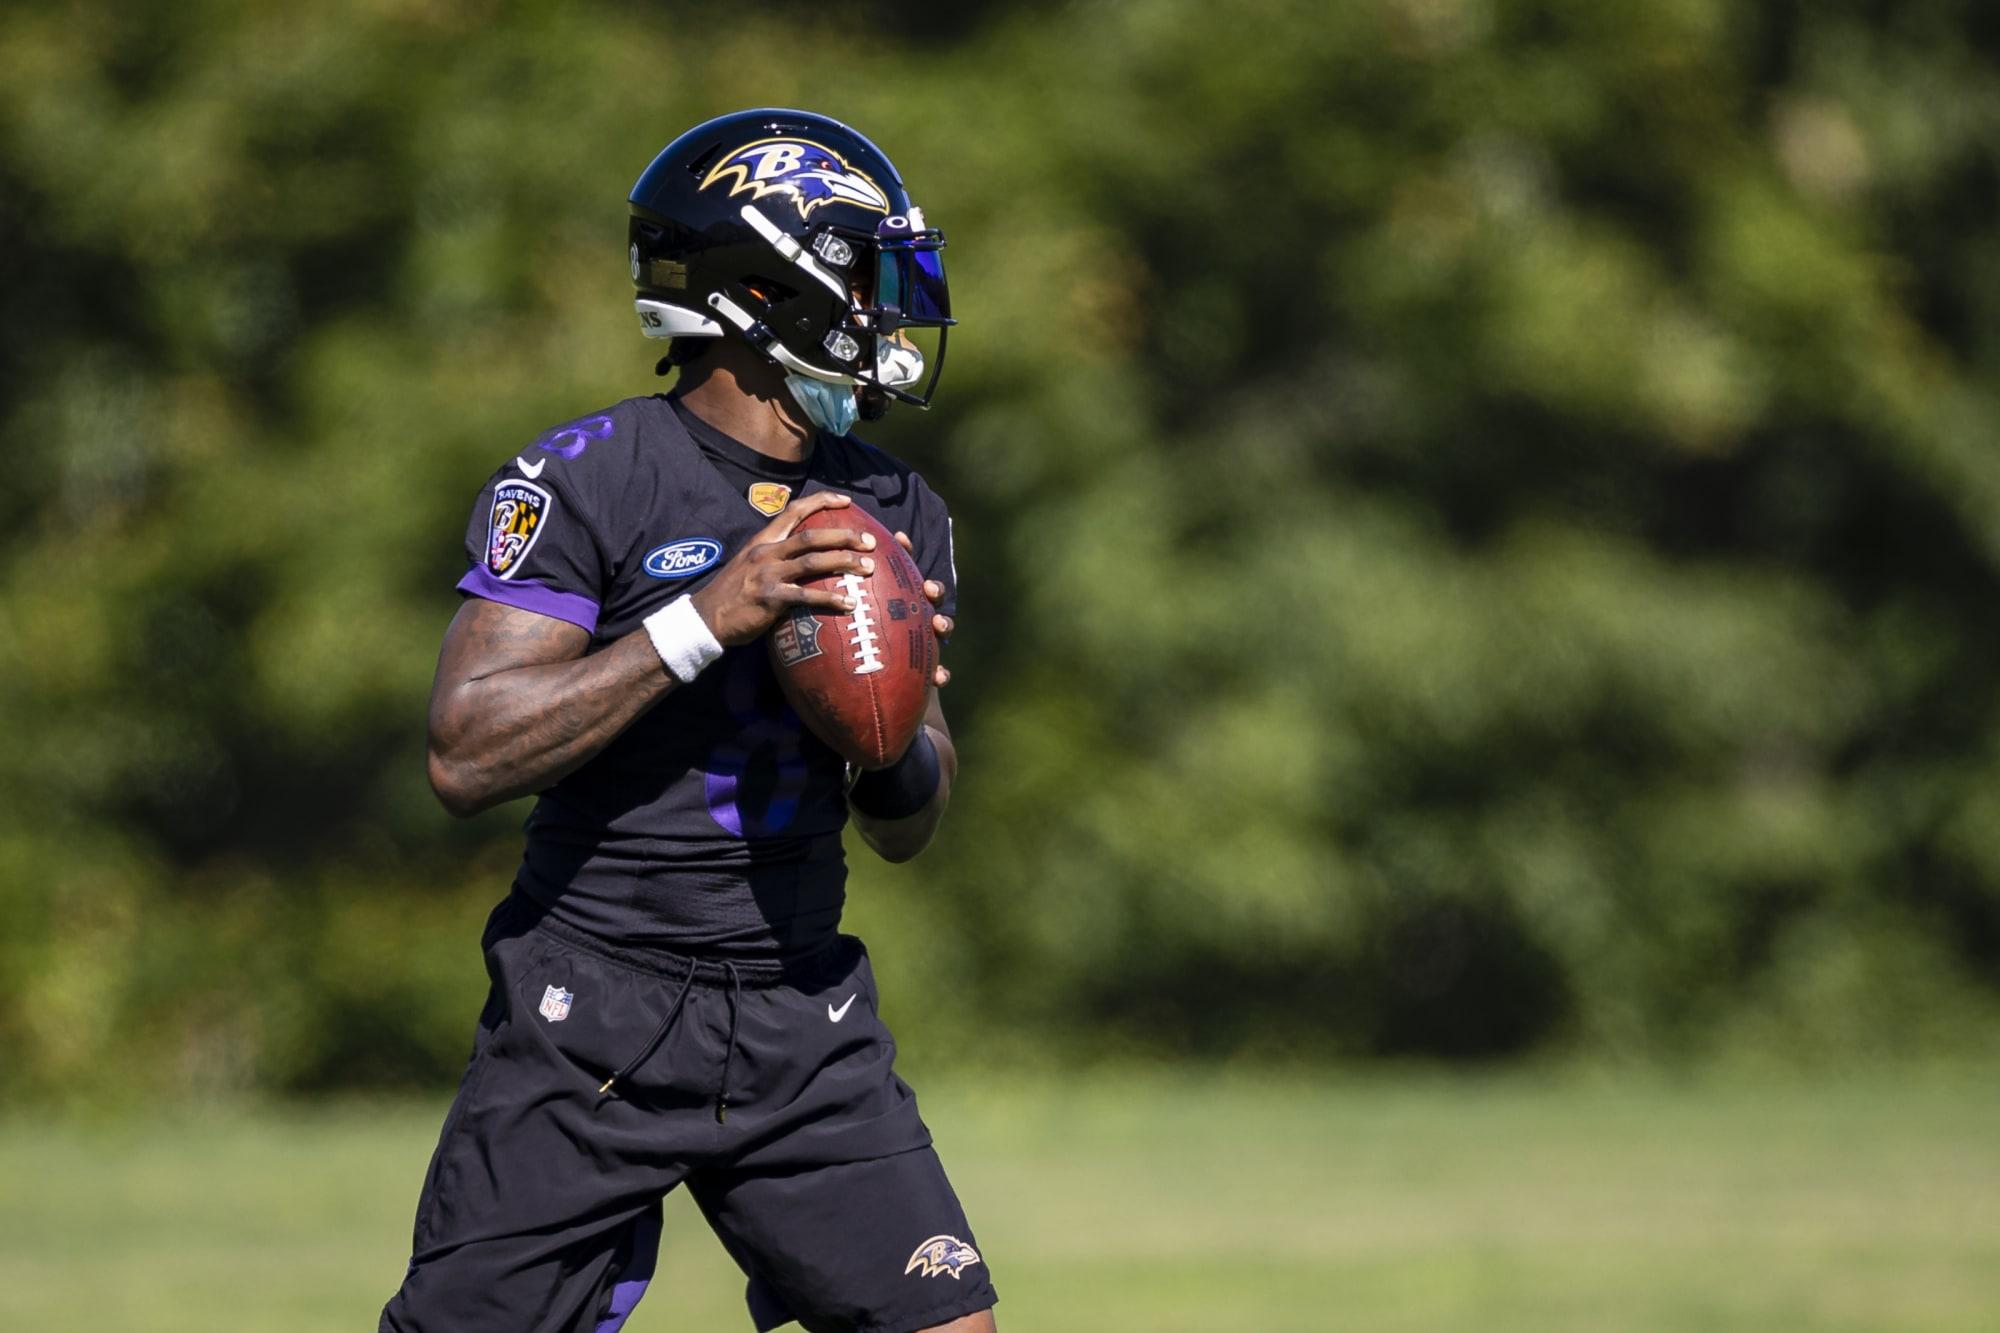 Saints vs. Ravens live stream Reddit for first preseason game